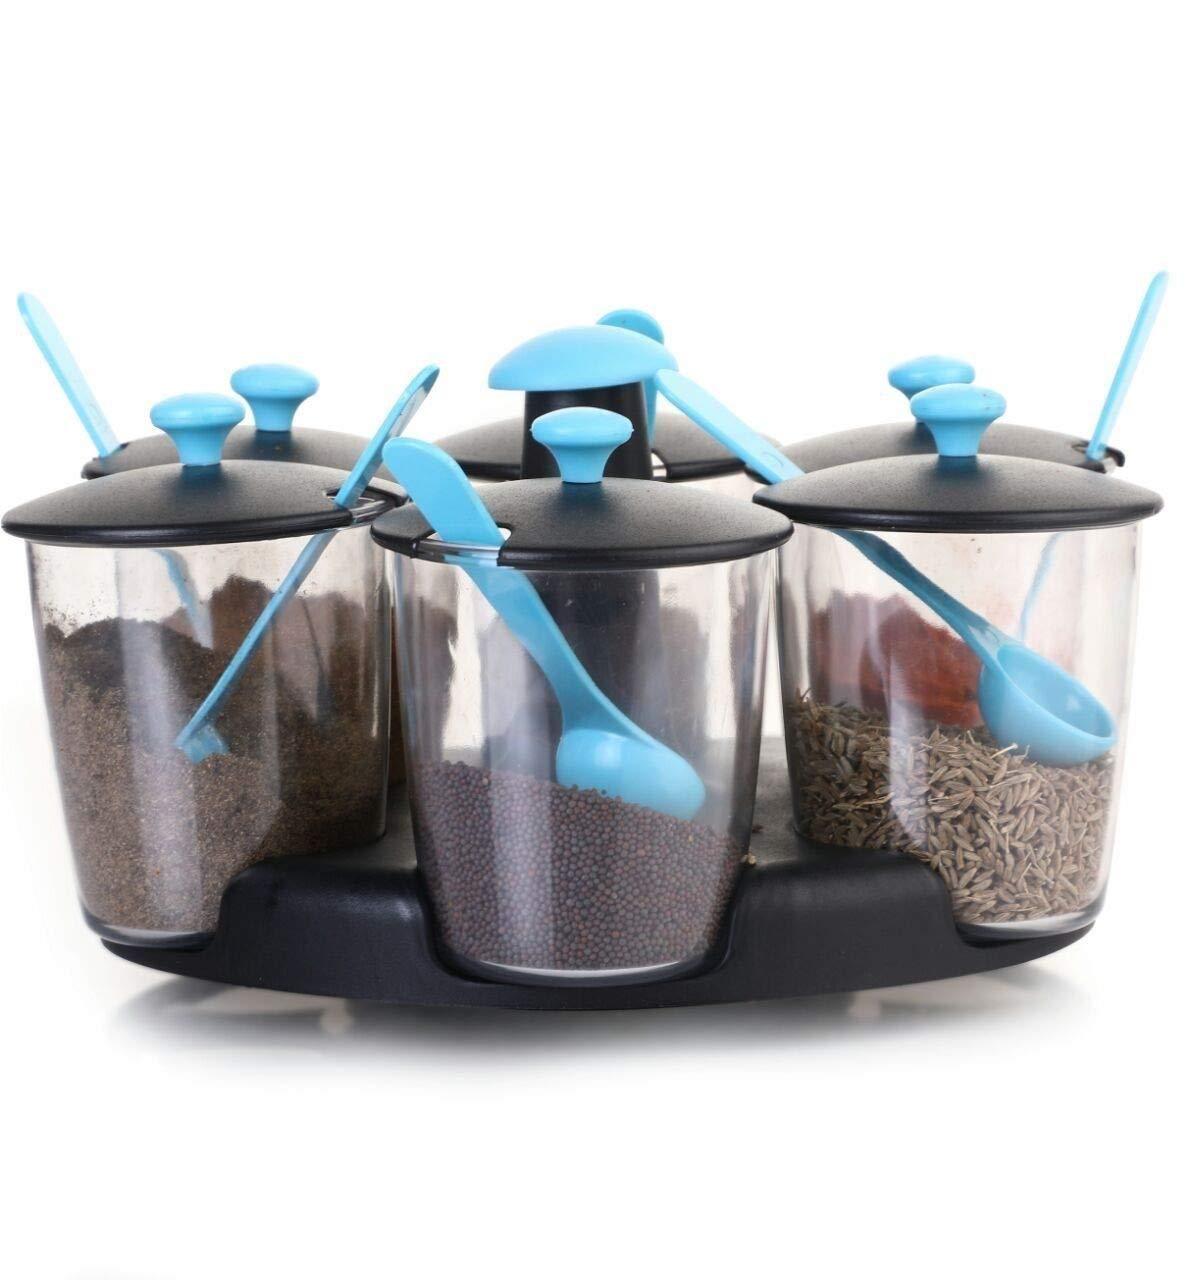 Modern Masala/Pickle Stand 6 Jar Revolving Multipurpose Stand